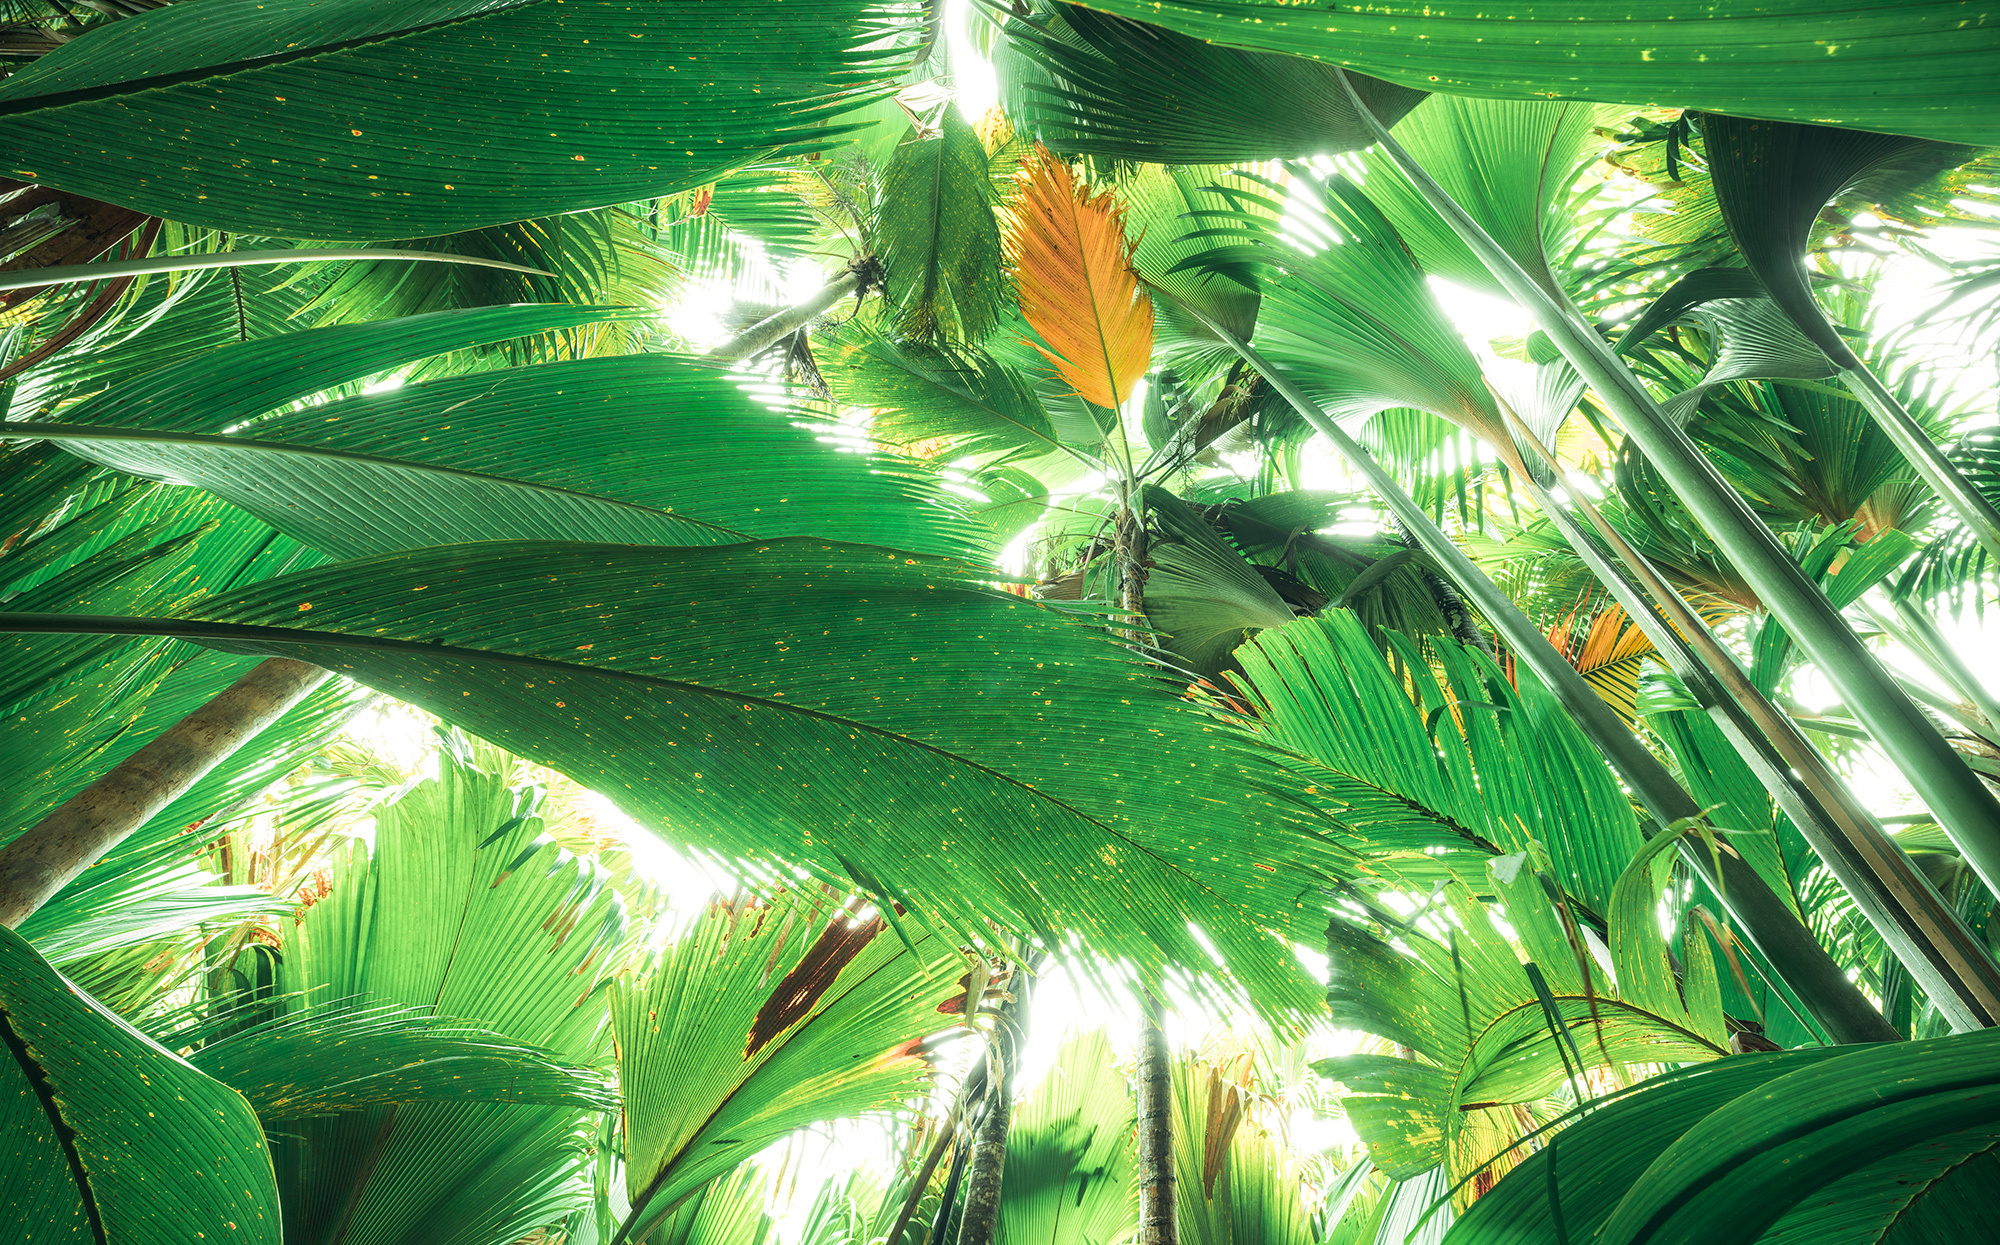 Stefan Hefele Edition 2 Fotobehang Komar - Natuur behang DSCHUNGELDACH II